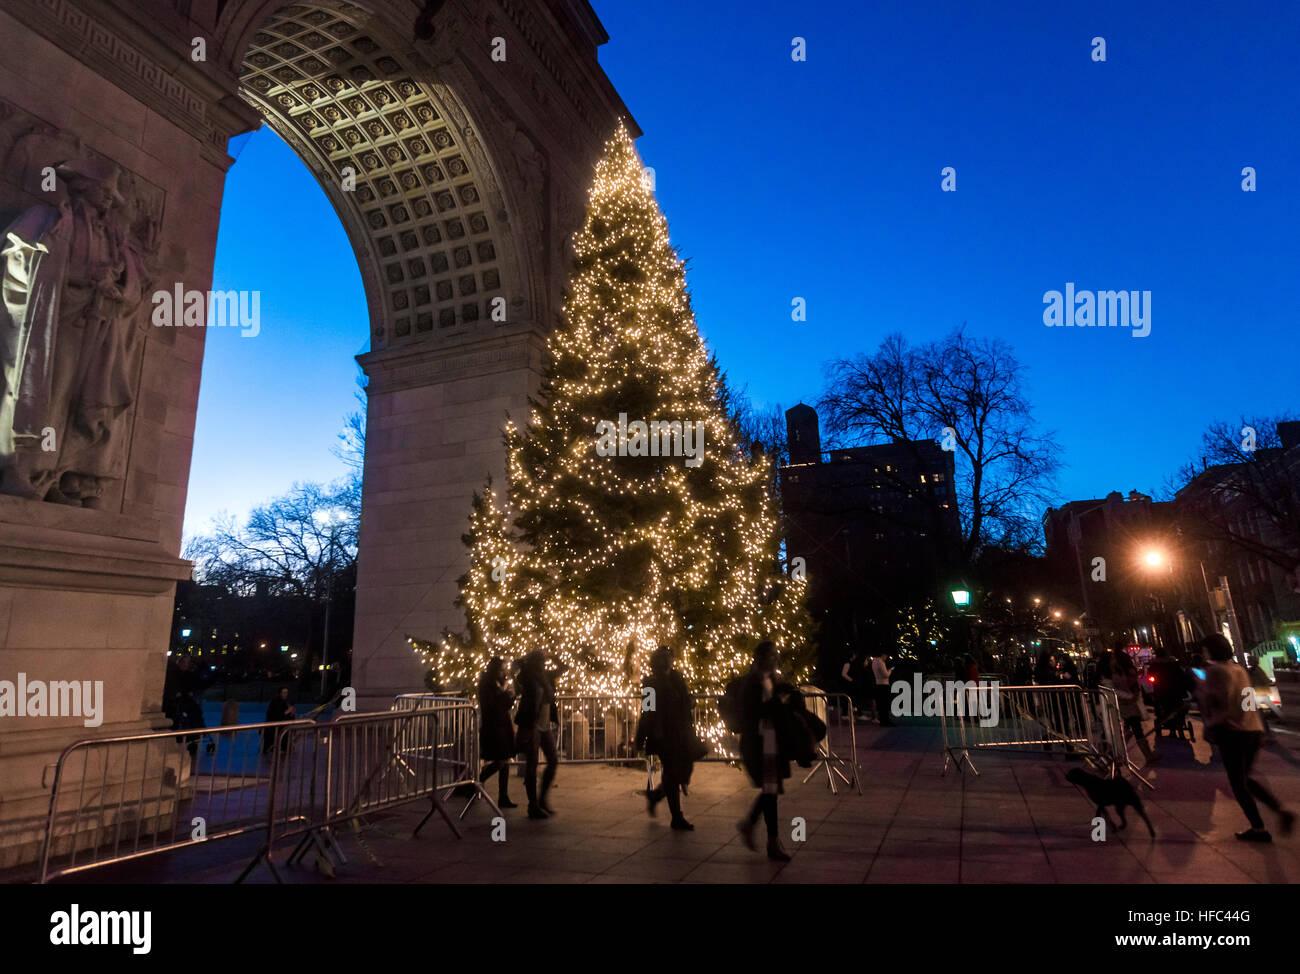 New York, NY 27 December 2016 - Christmas tree in Washington Square Park ©Stacy Walsh Rosenstock - Stock Image